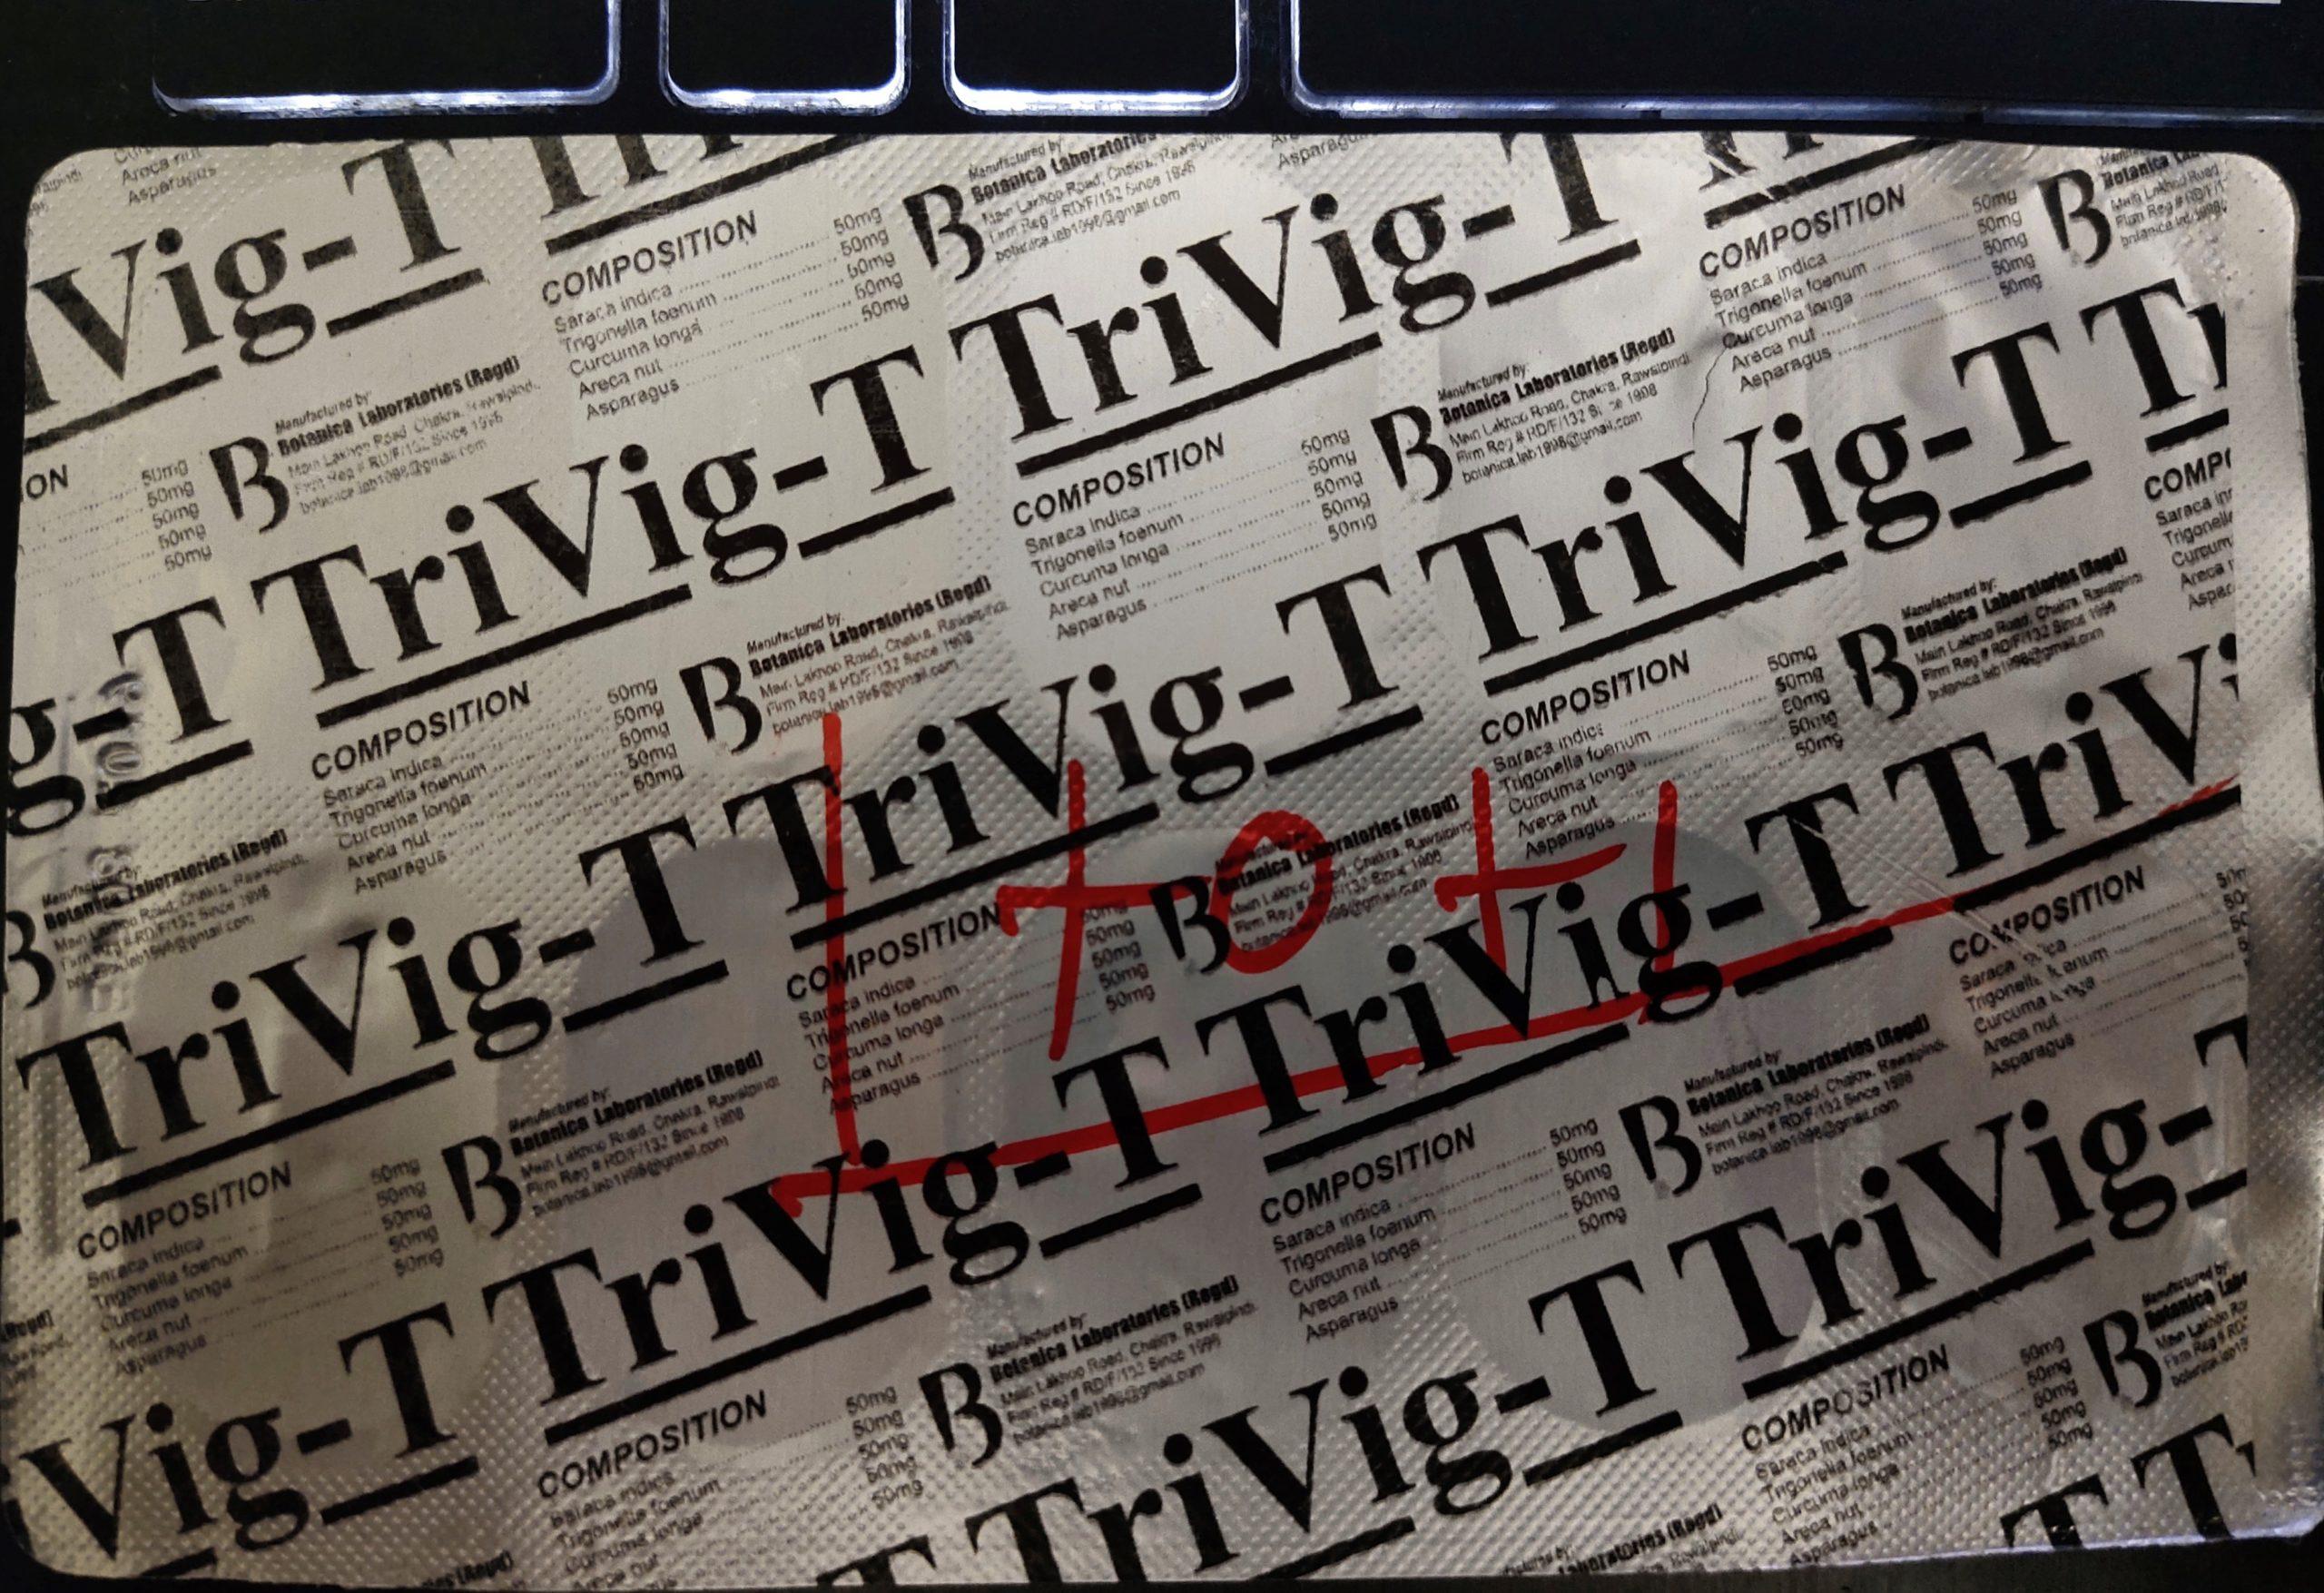 TriVig-T